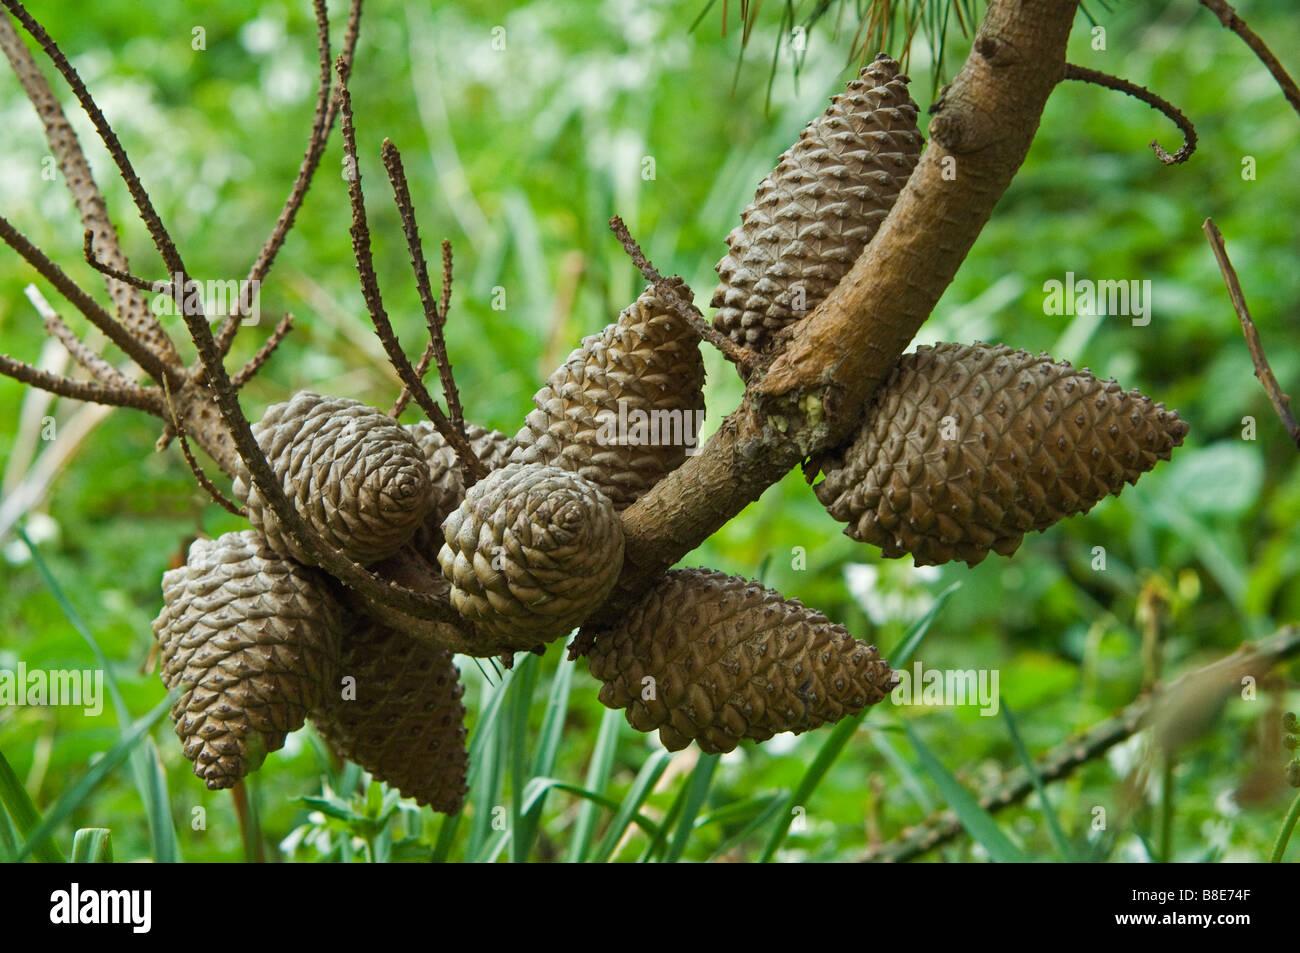 Monterey Pine Cones on Tresco in the Scilly Isles - Stock Image